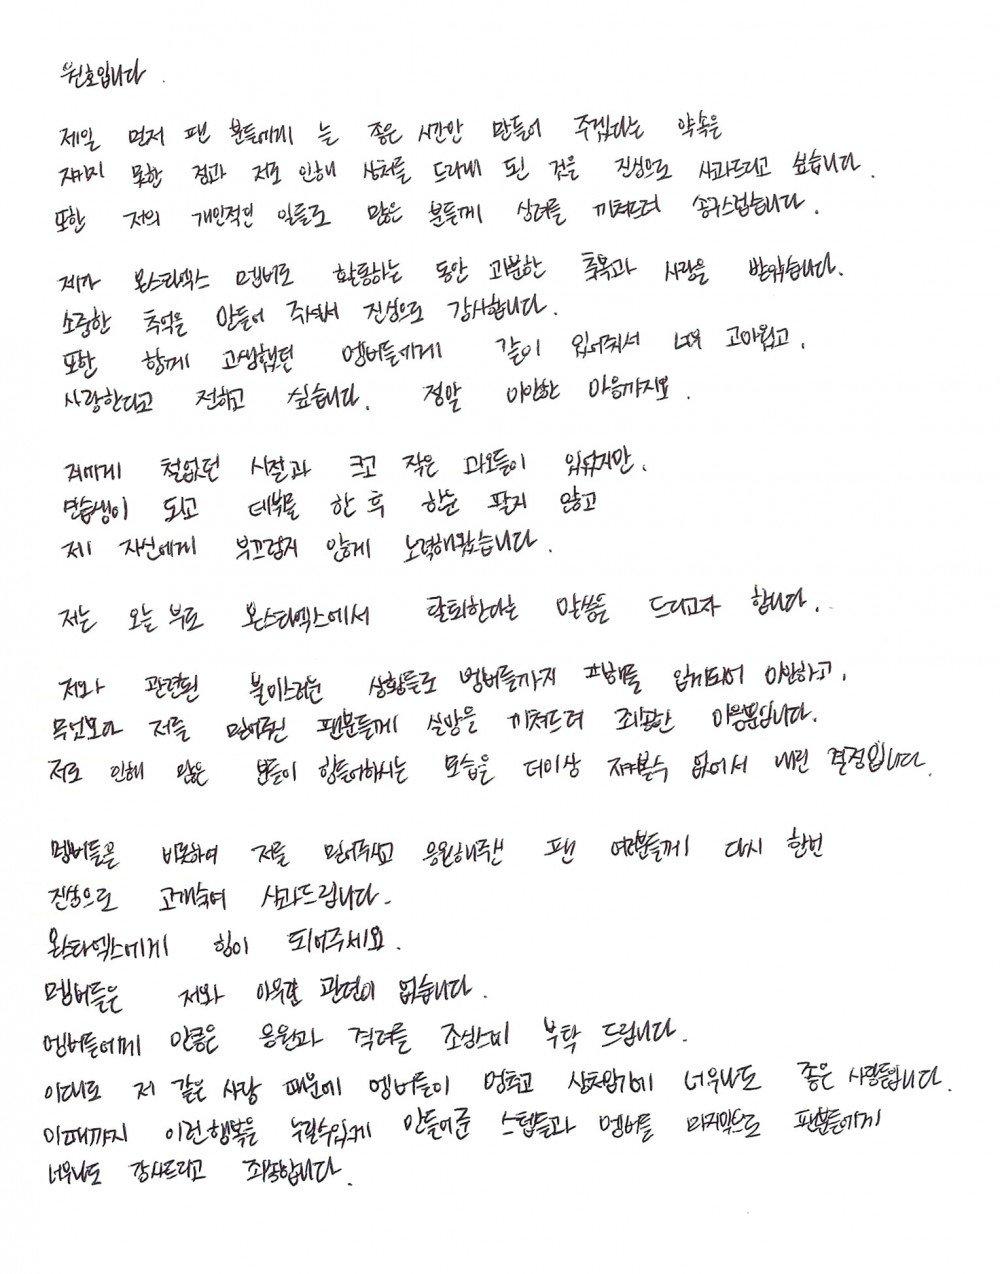 Wonho Leaves Letter For Fans After Exit From Monsta X Allkpop